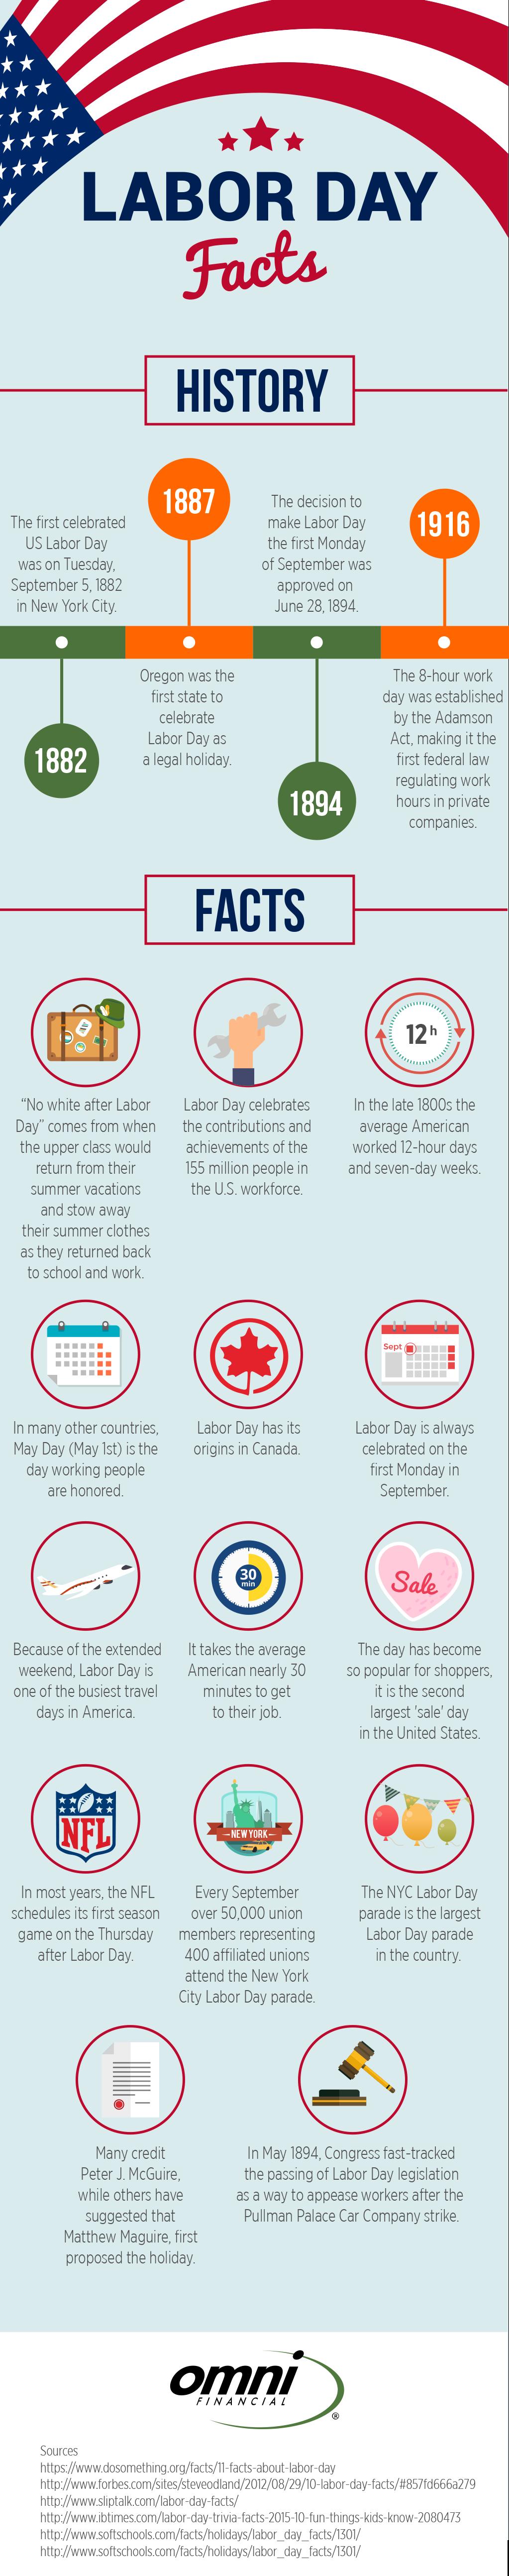 Omni-LaborDay-Infographic (1)